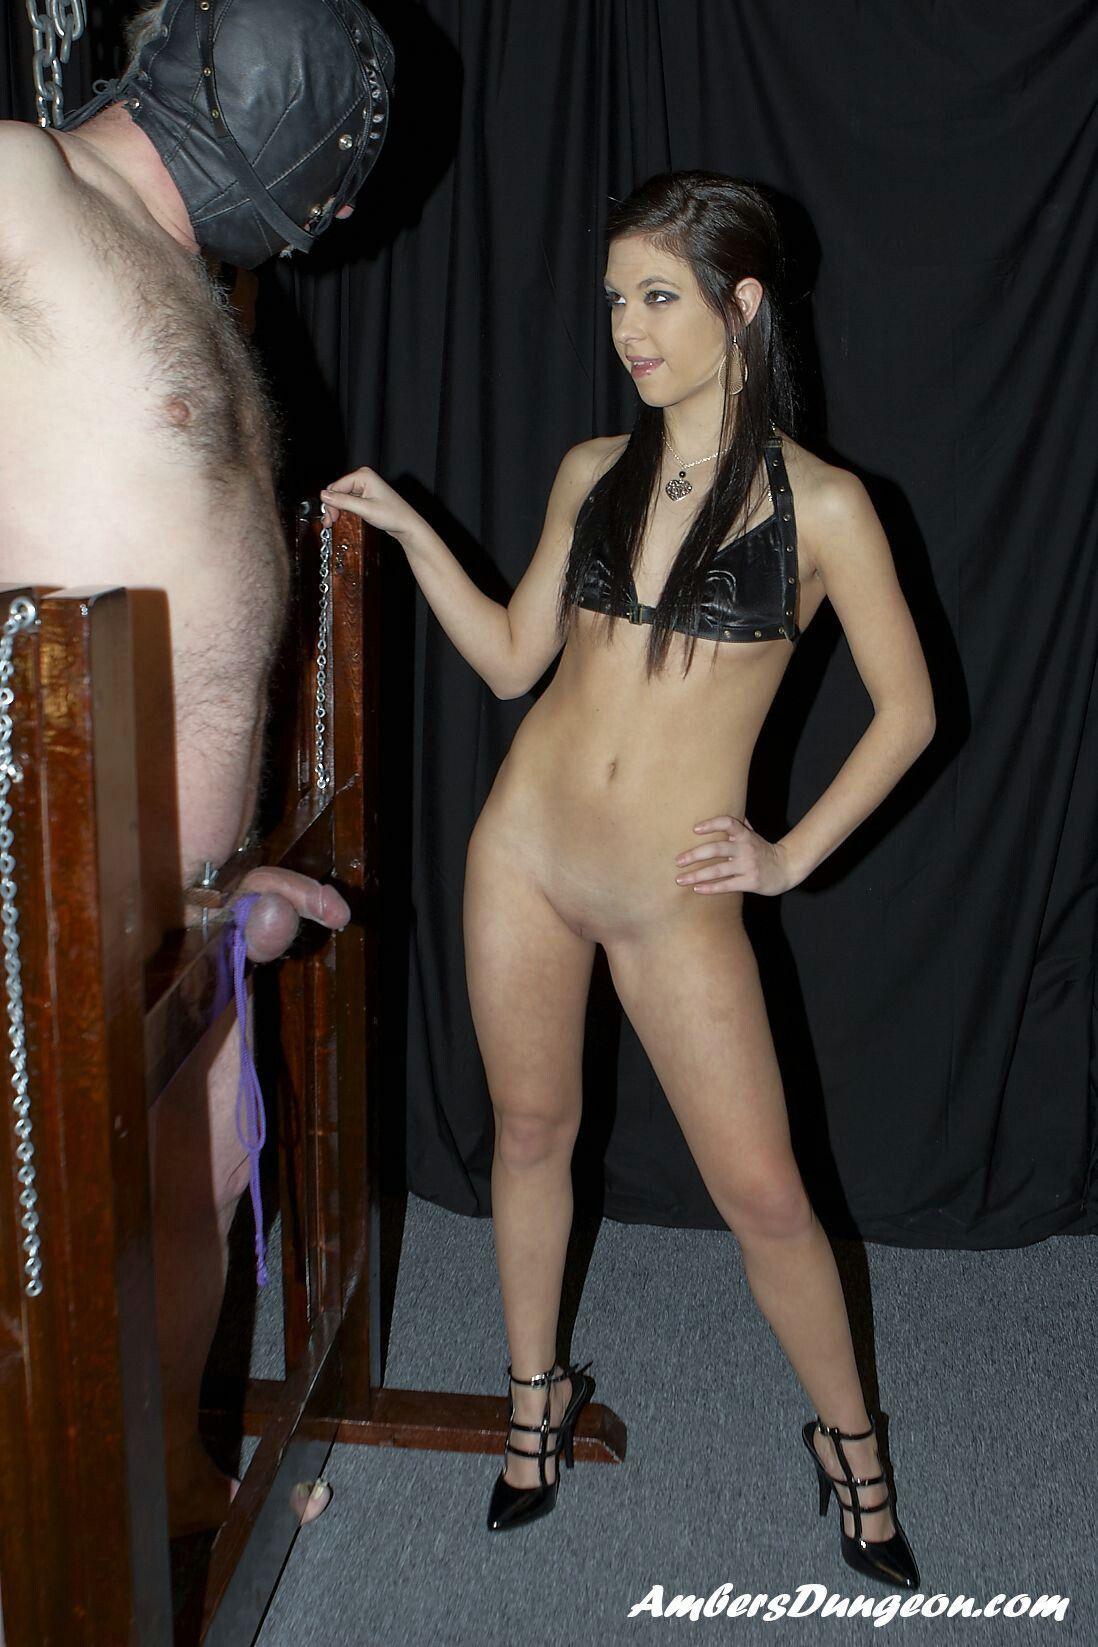 Teen Dominatrix Ladies slap subs